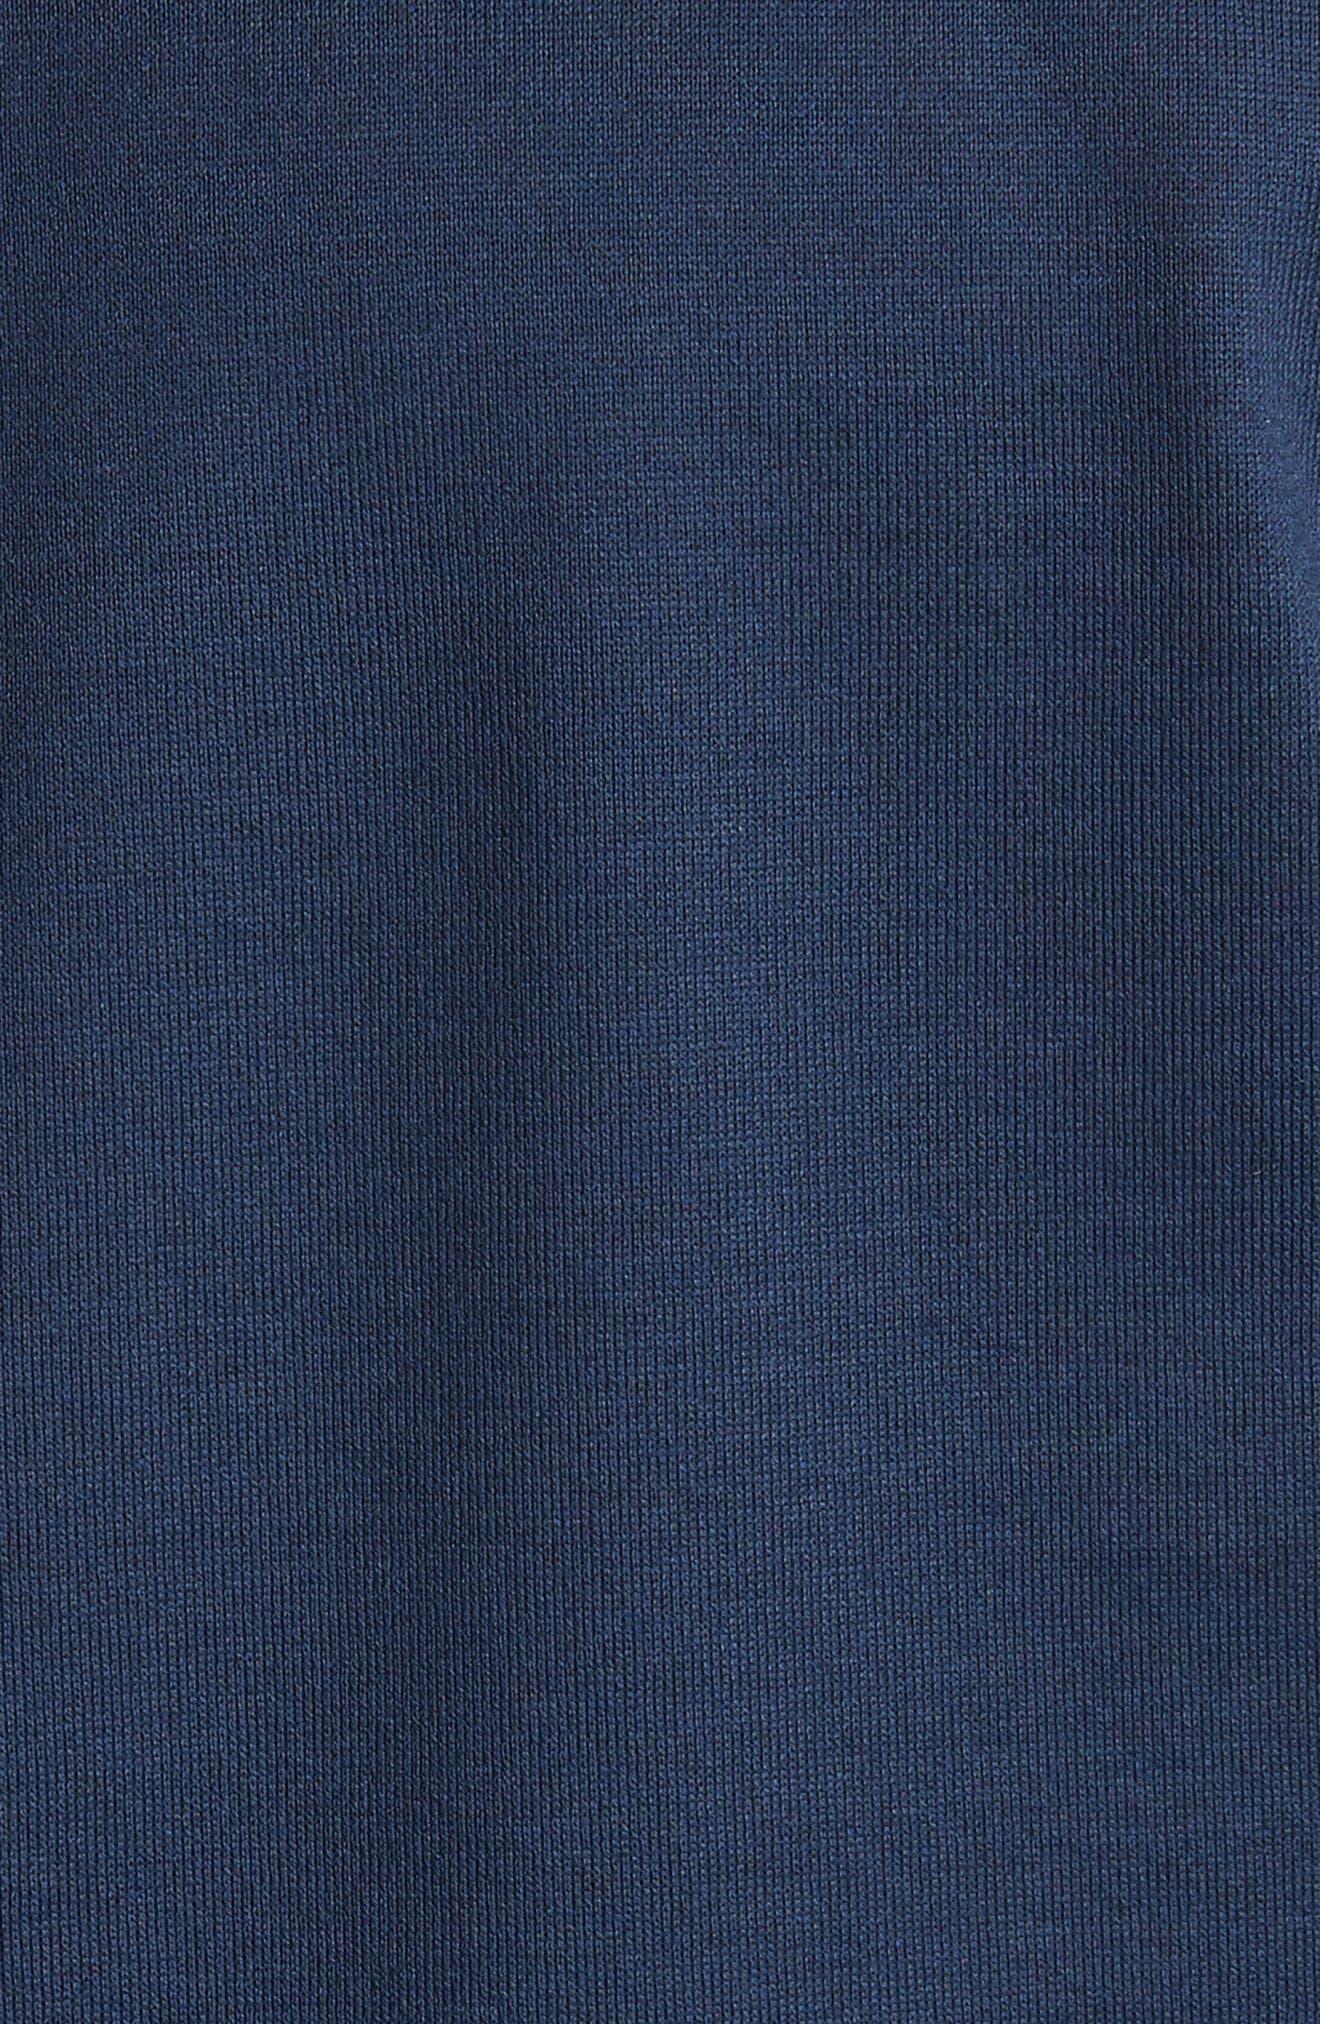 Niels N-Logo T-Shirt,                             Alternate thumbnail 5, color,                             410